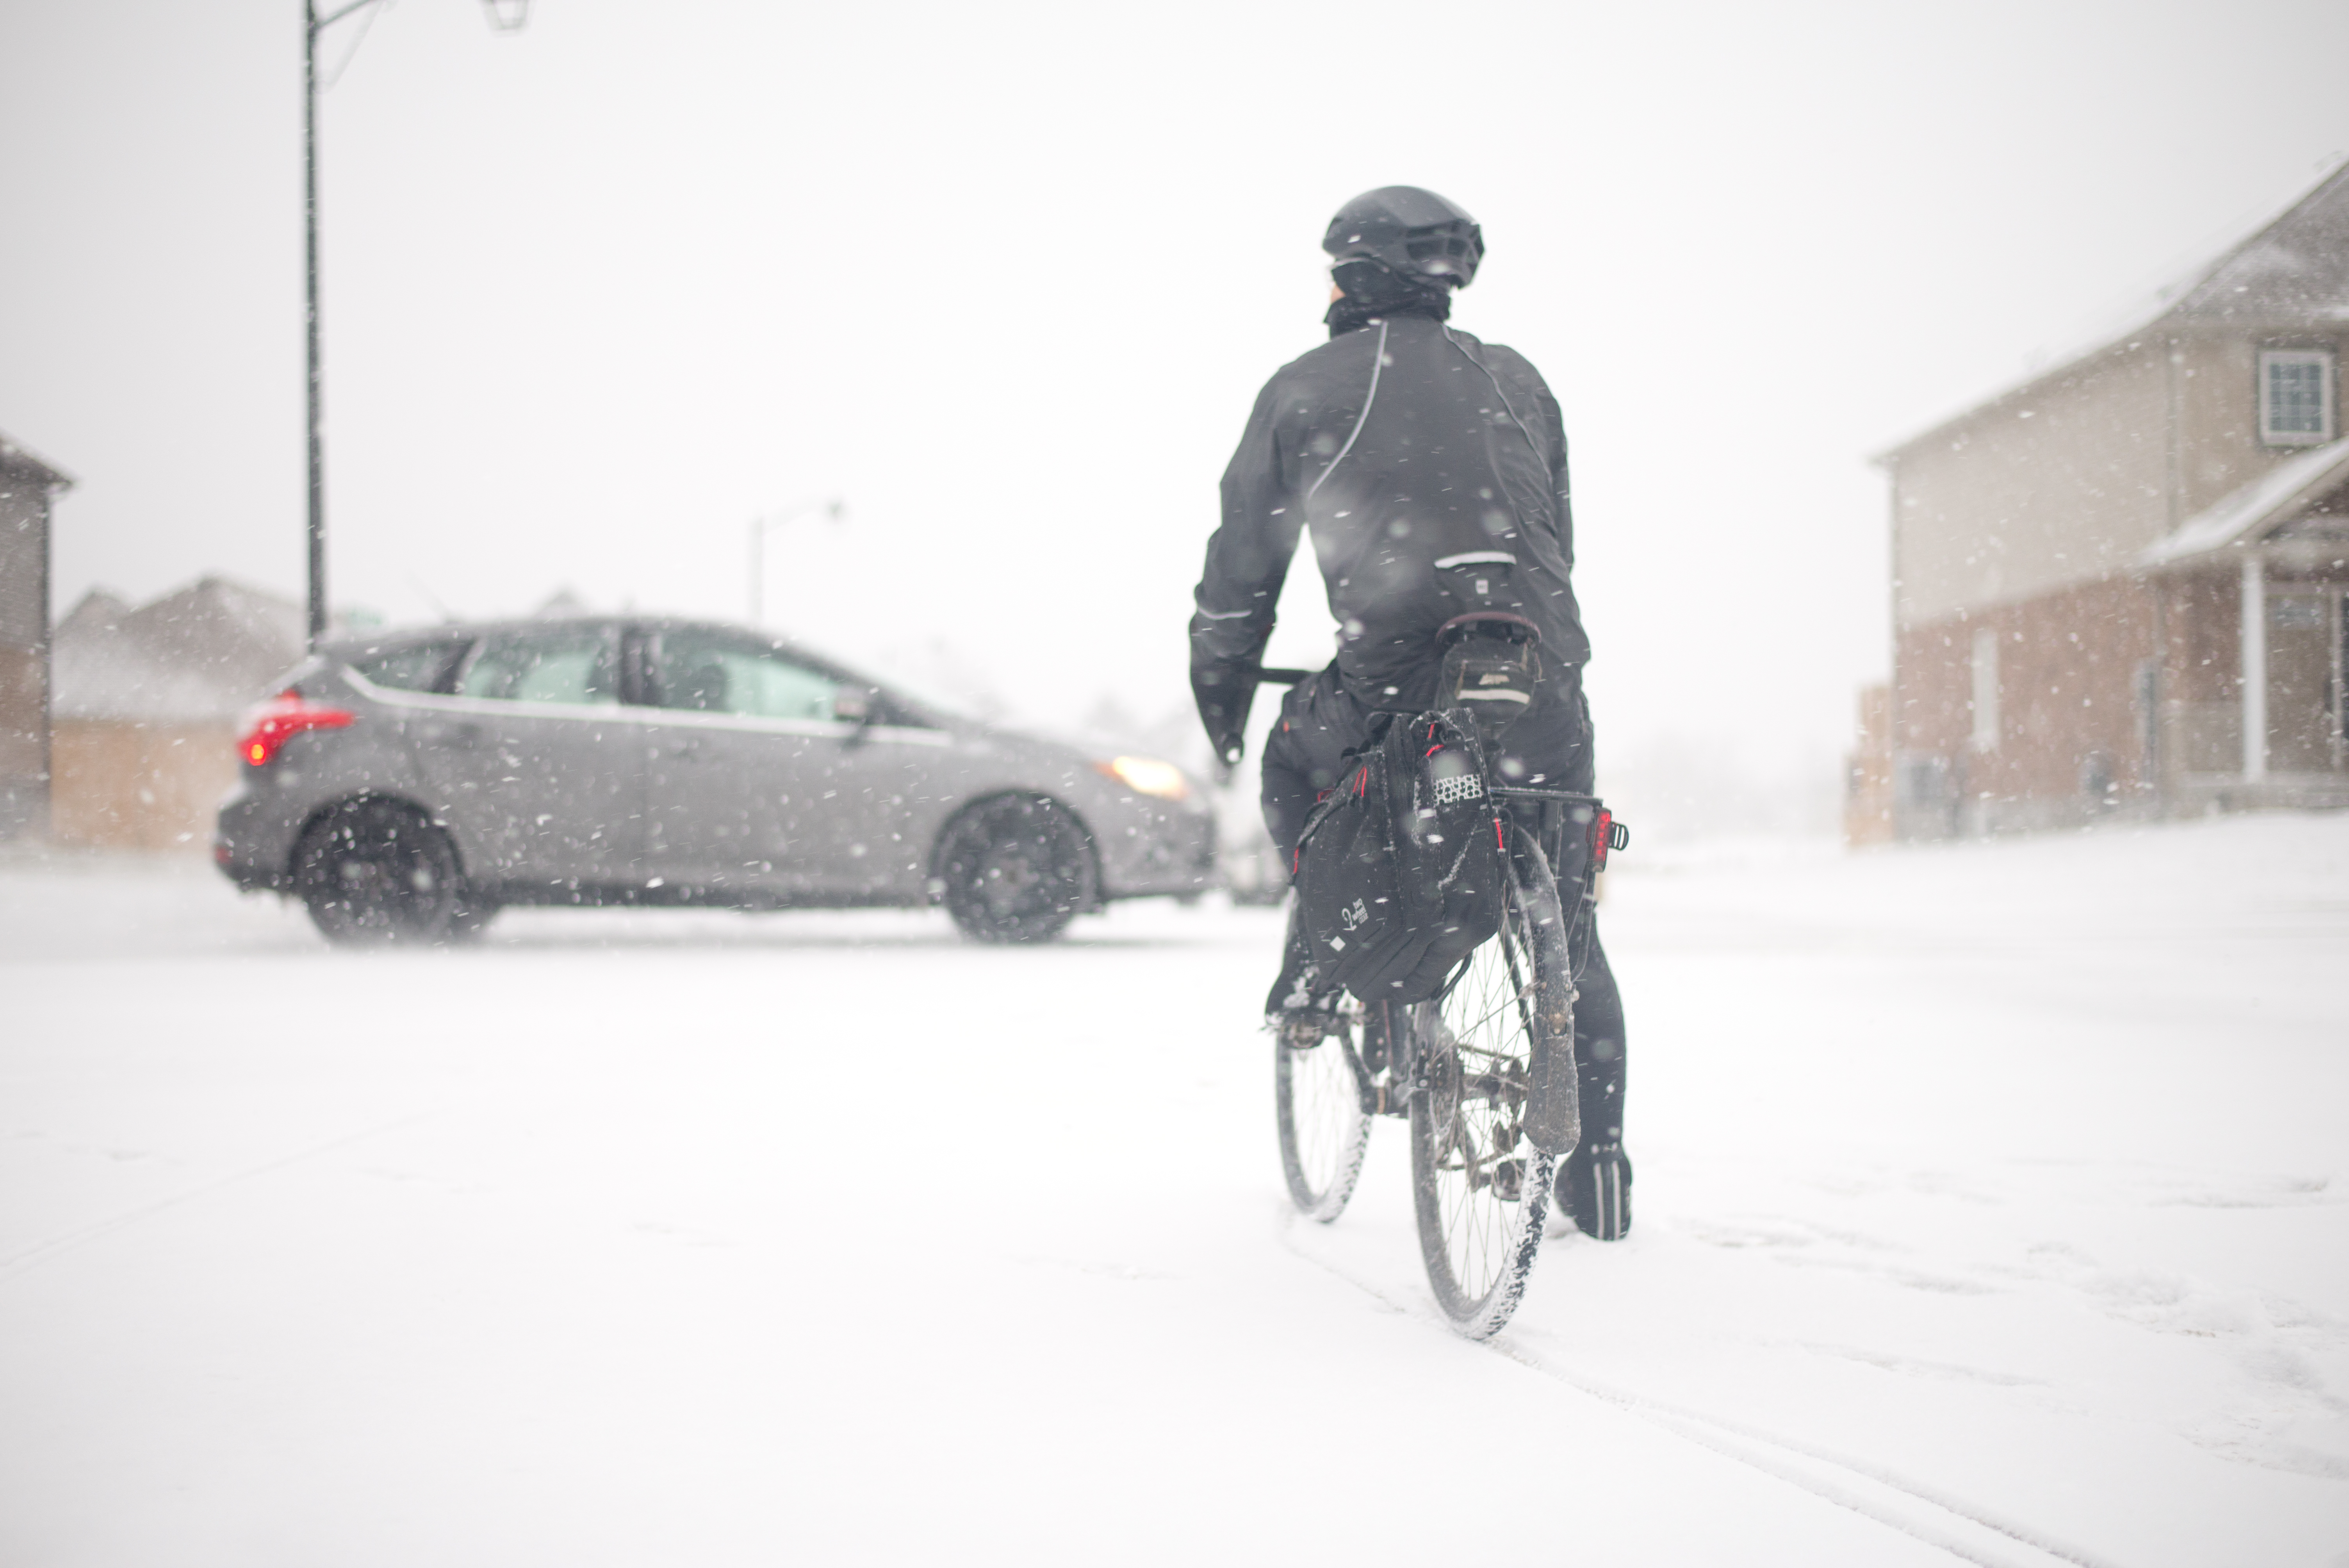 Winter bike commuter with pannier